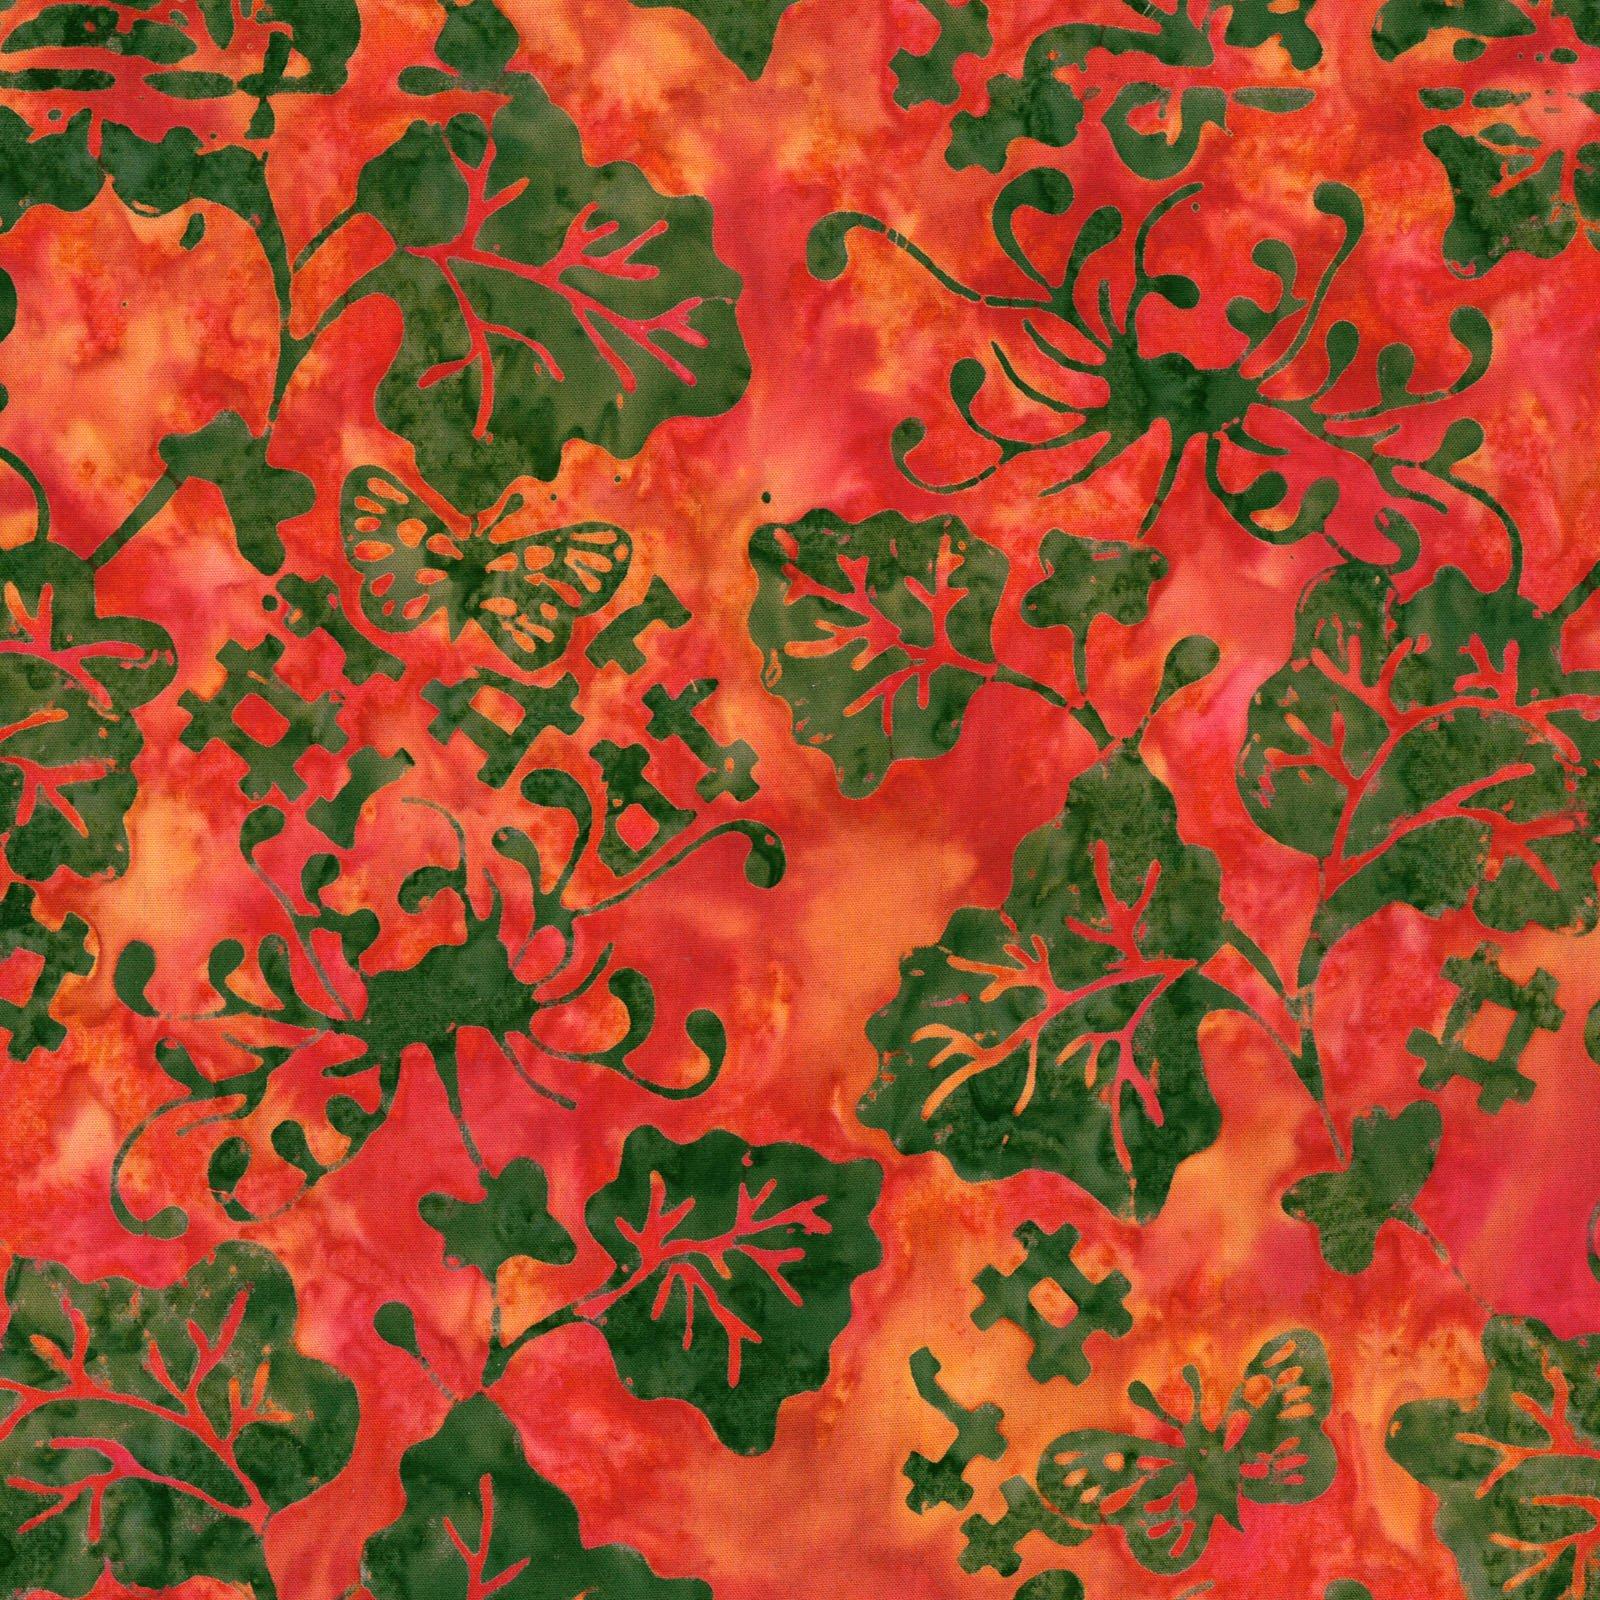 Floragraphics Batik III by In The Beginning